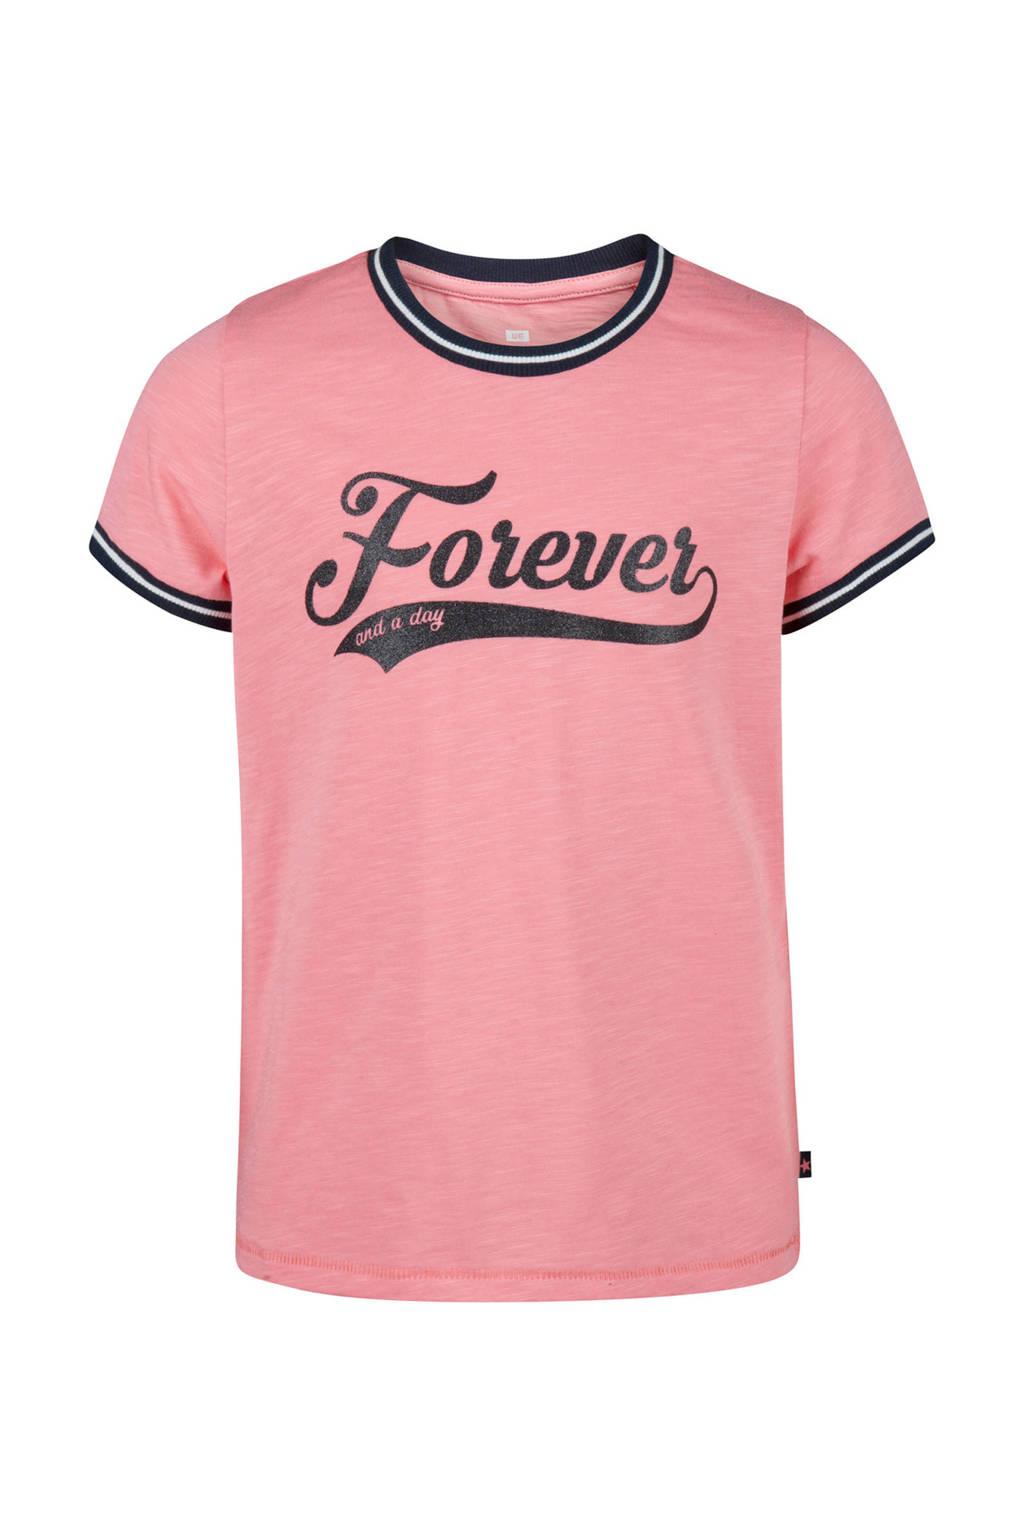 WE Fashion T-shirt met tekst roze, Roze/marine